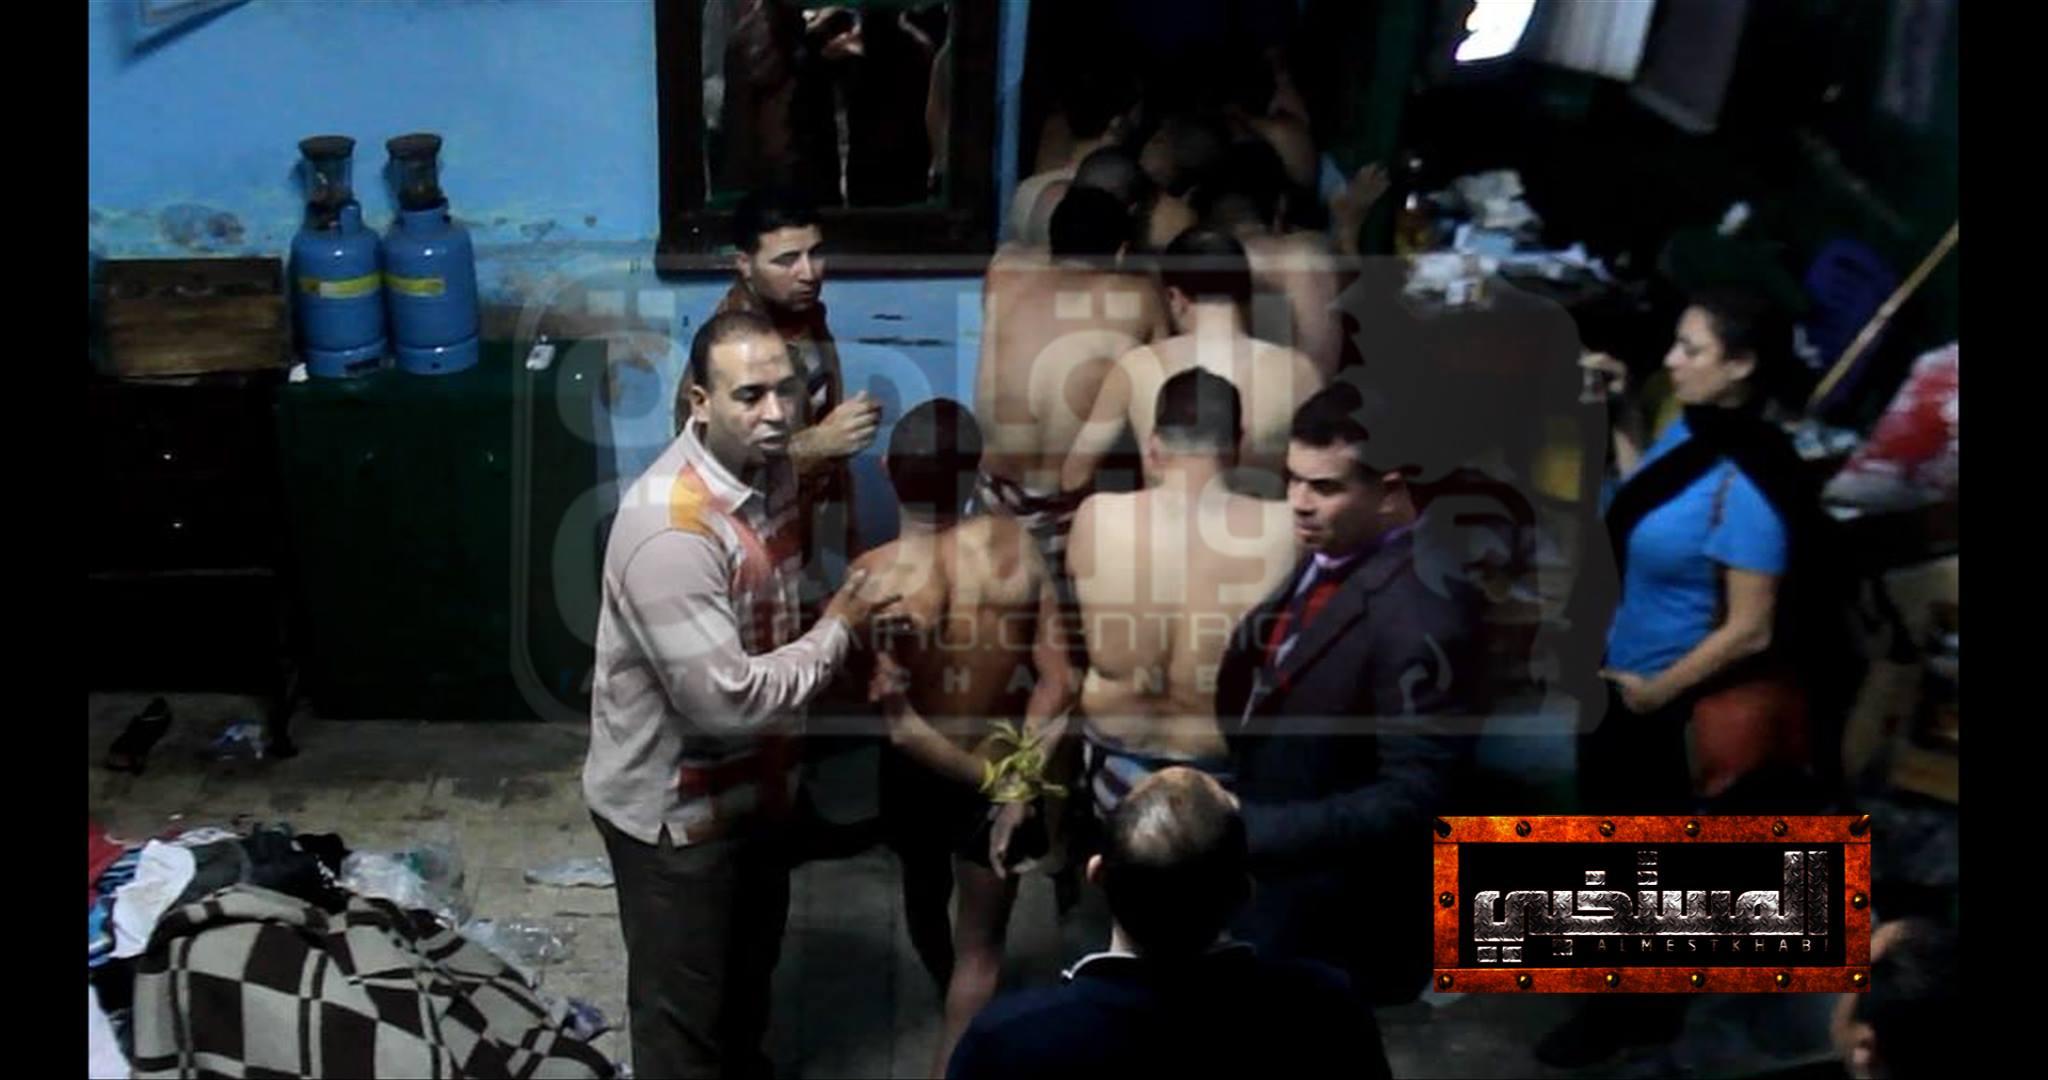 Bath Raid, Cairo December 7, 2014 (Mona Iraqi Facebook photo)